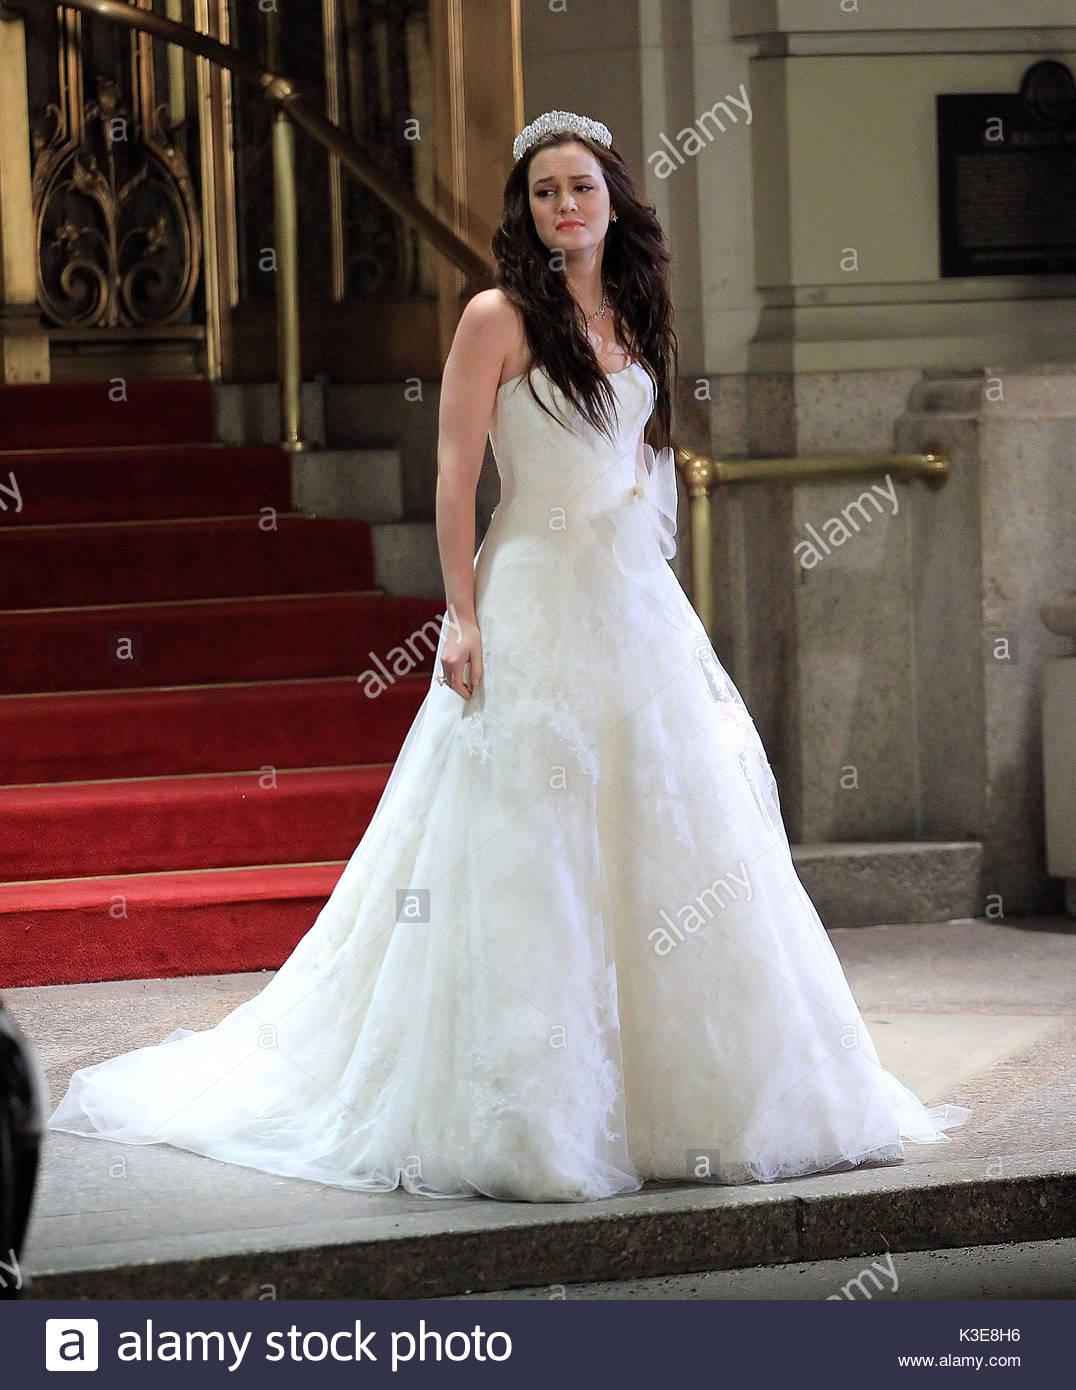 Leighton Meester. Leighton Meester wears a beautiful wedding dress ...